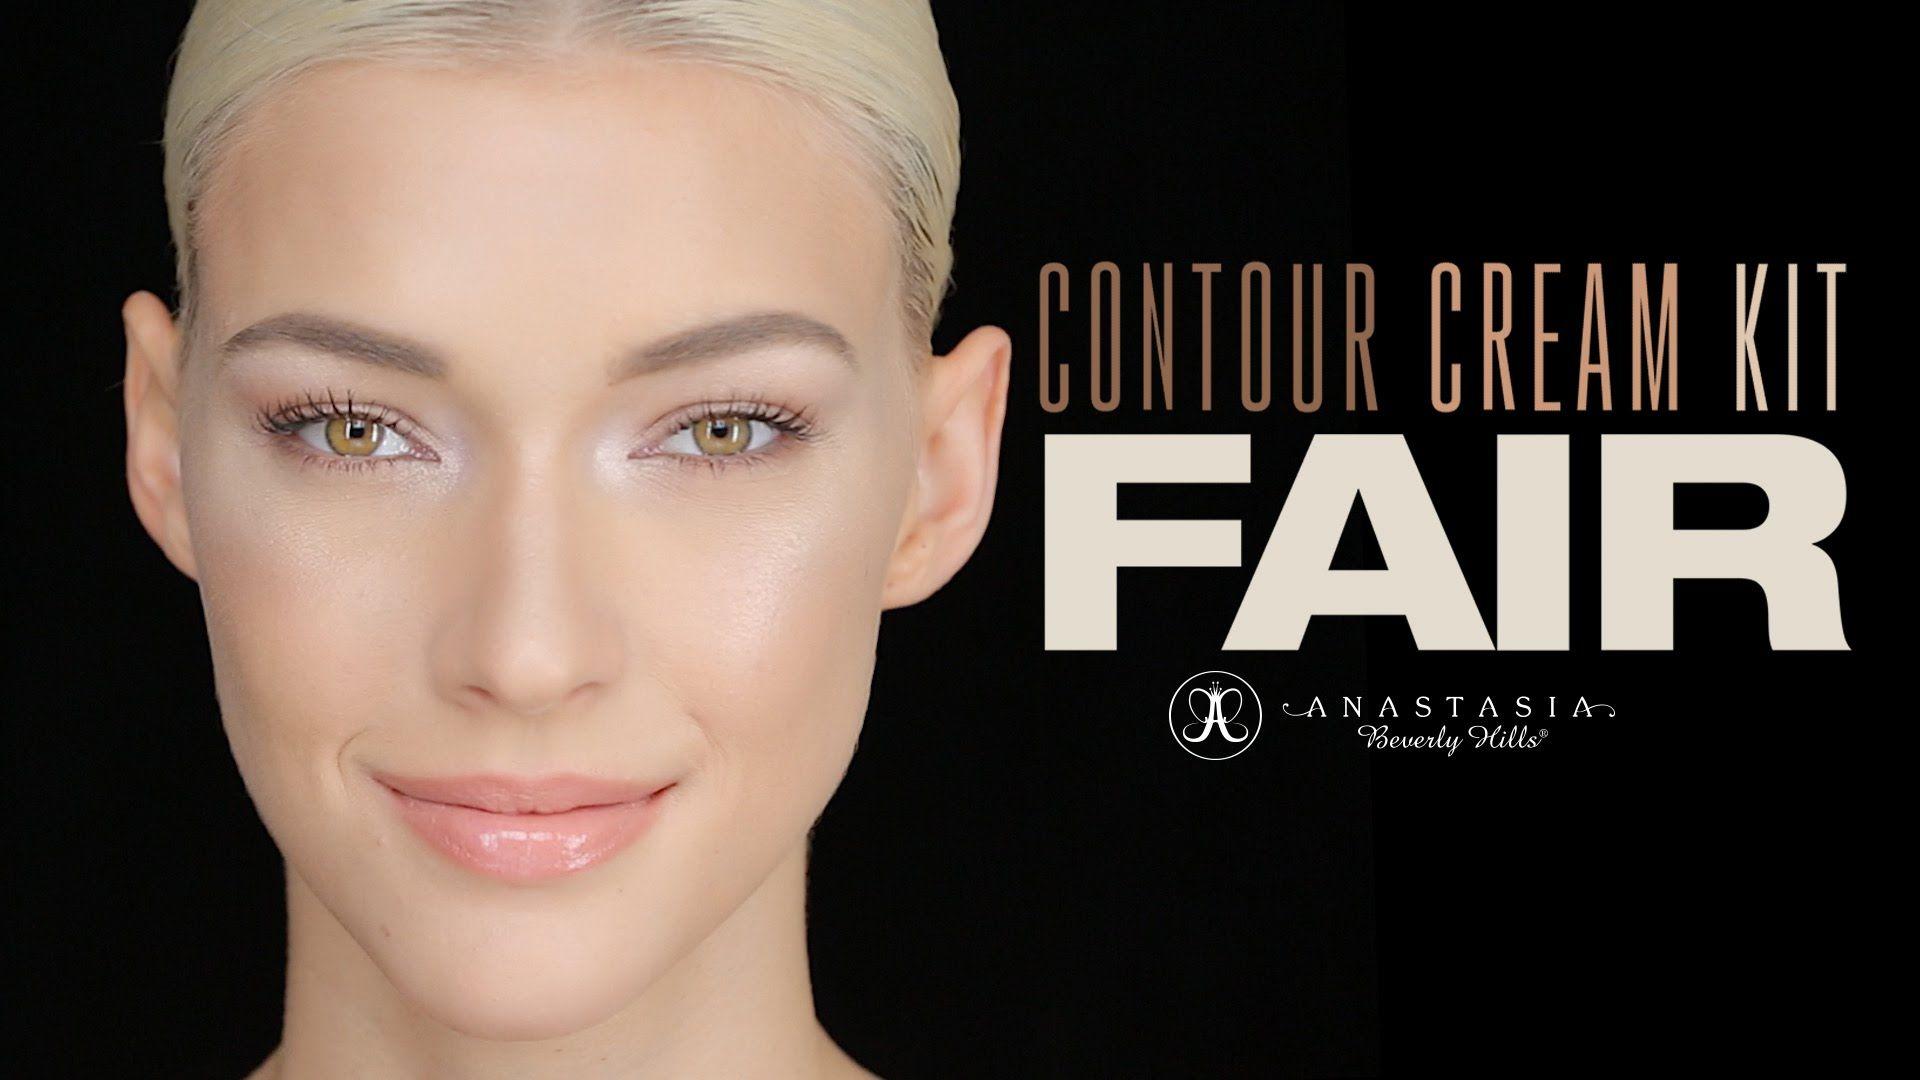 Brand new Fair Cream Contour Kit tutorial by makeup artist